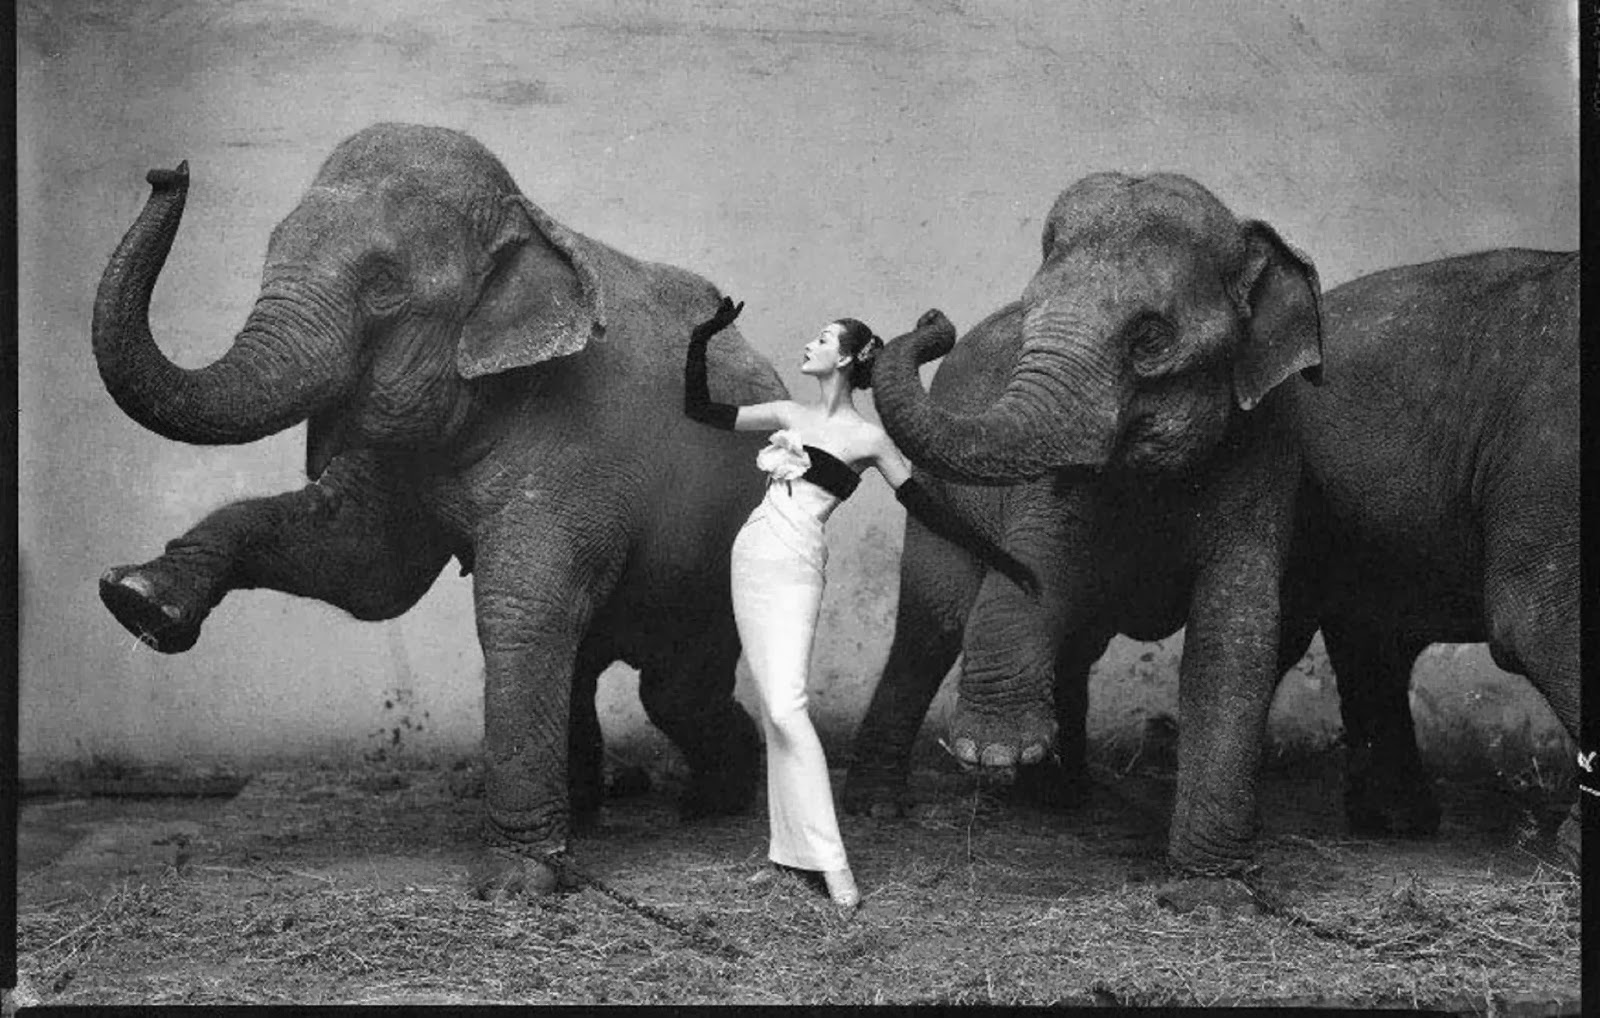 Domiva with Elephants, Richard Avedon